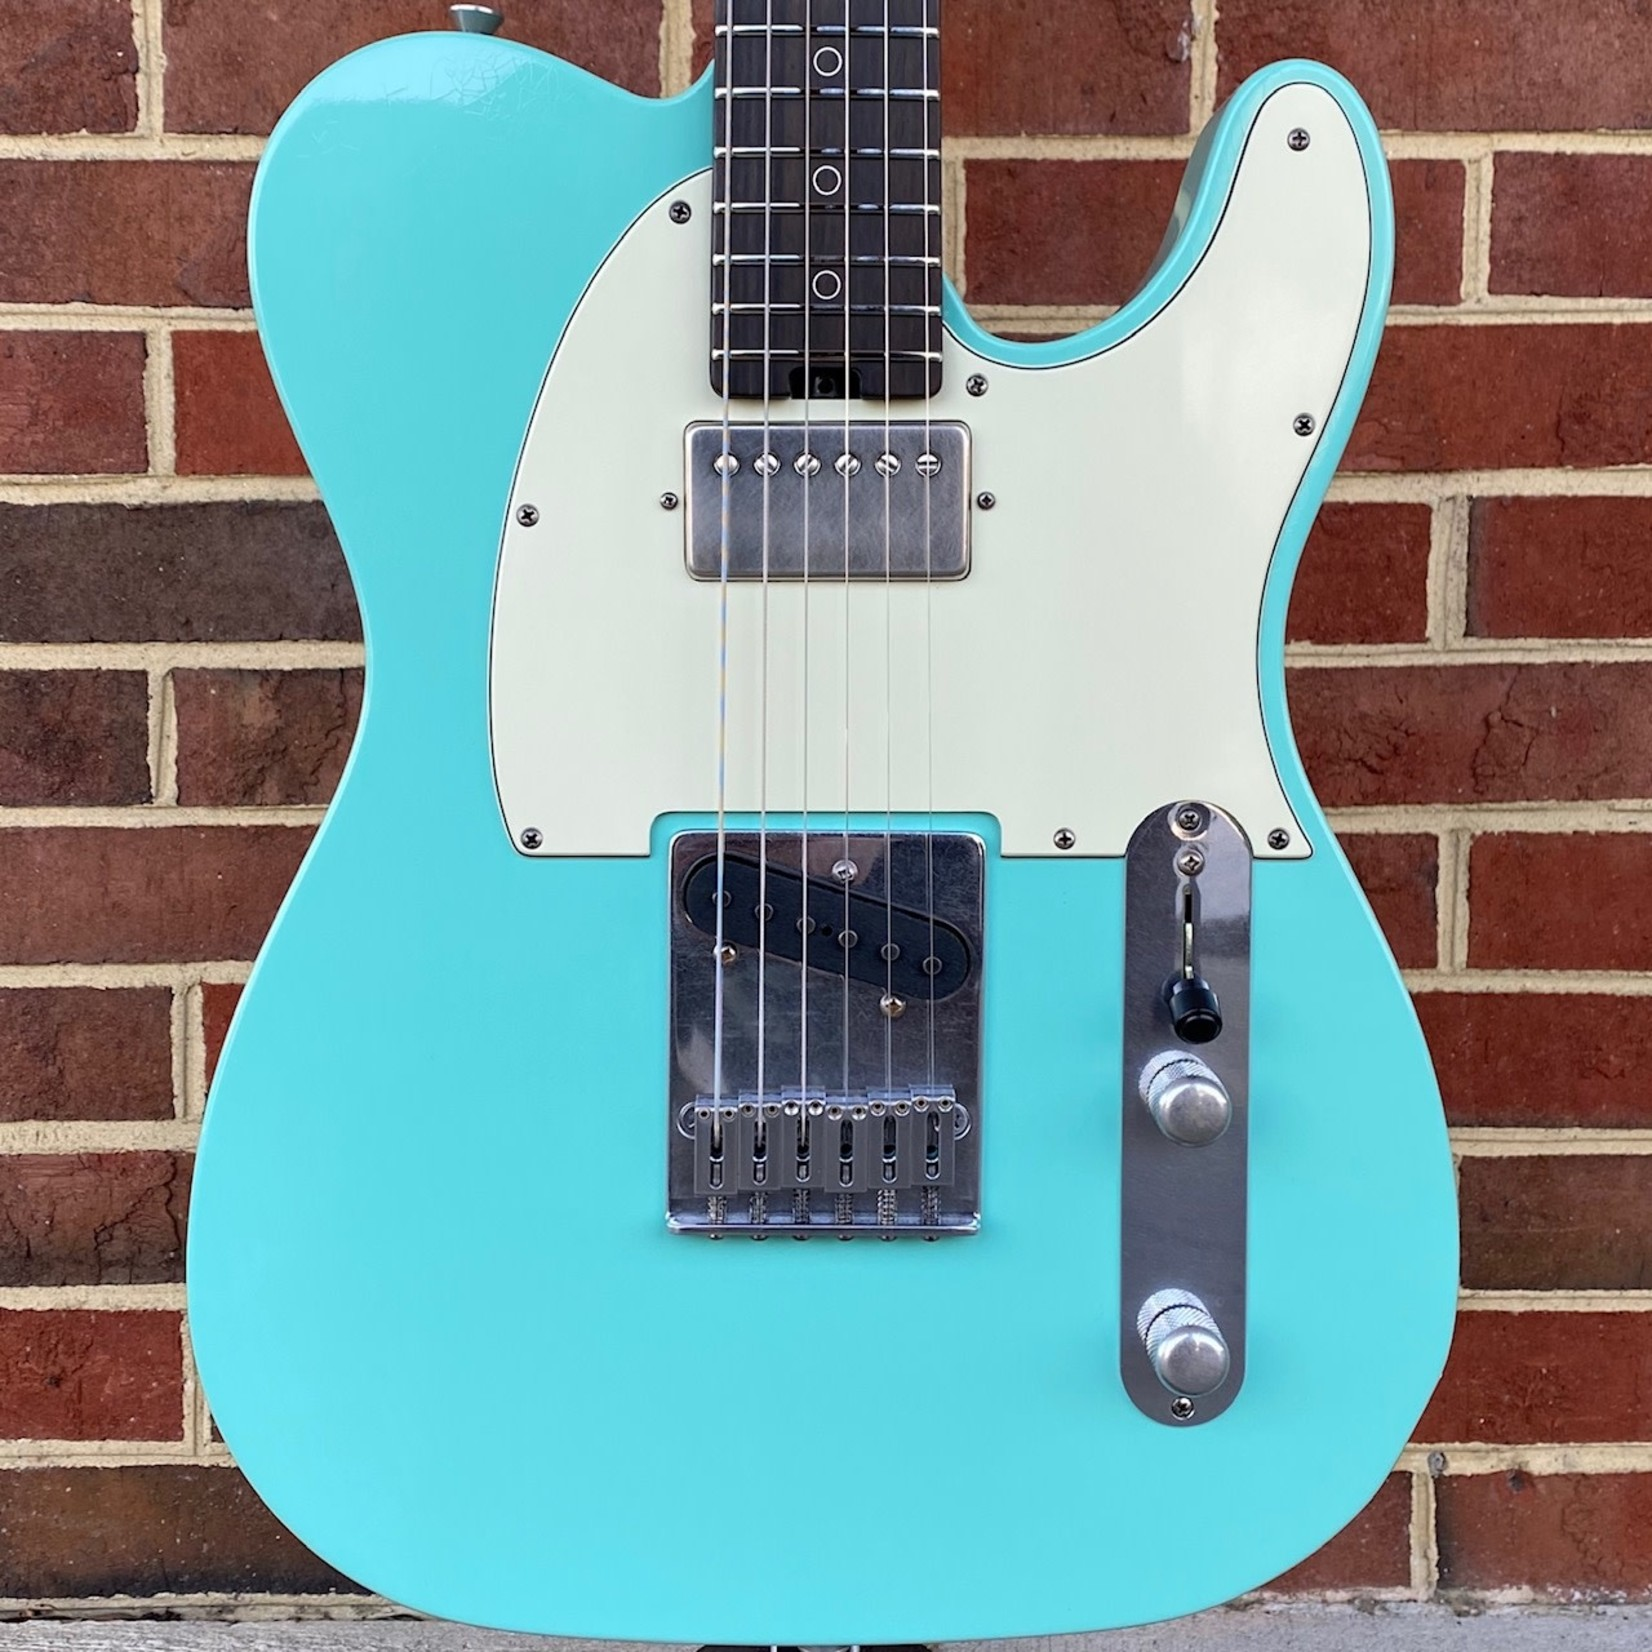 Schecter Guitar Research Schecter USA Custom Shop Nick Johnston PT, Atomic Green, Wenge Neck, Macassar Ebony, Alder Body, Aged Hardware, Hardshell Case